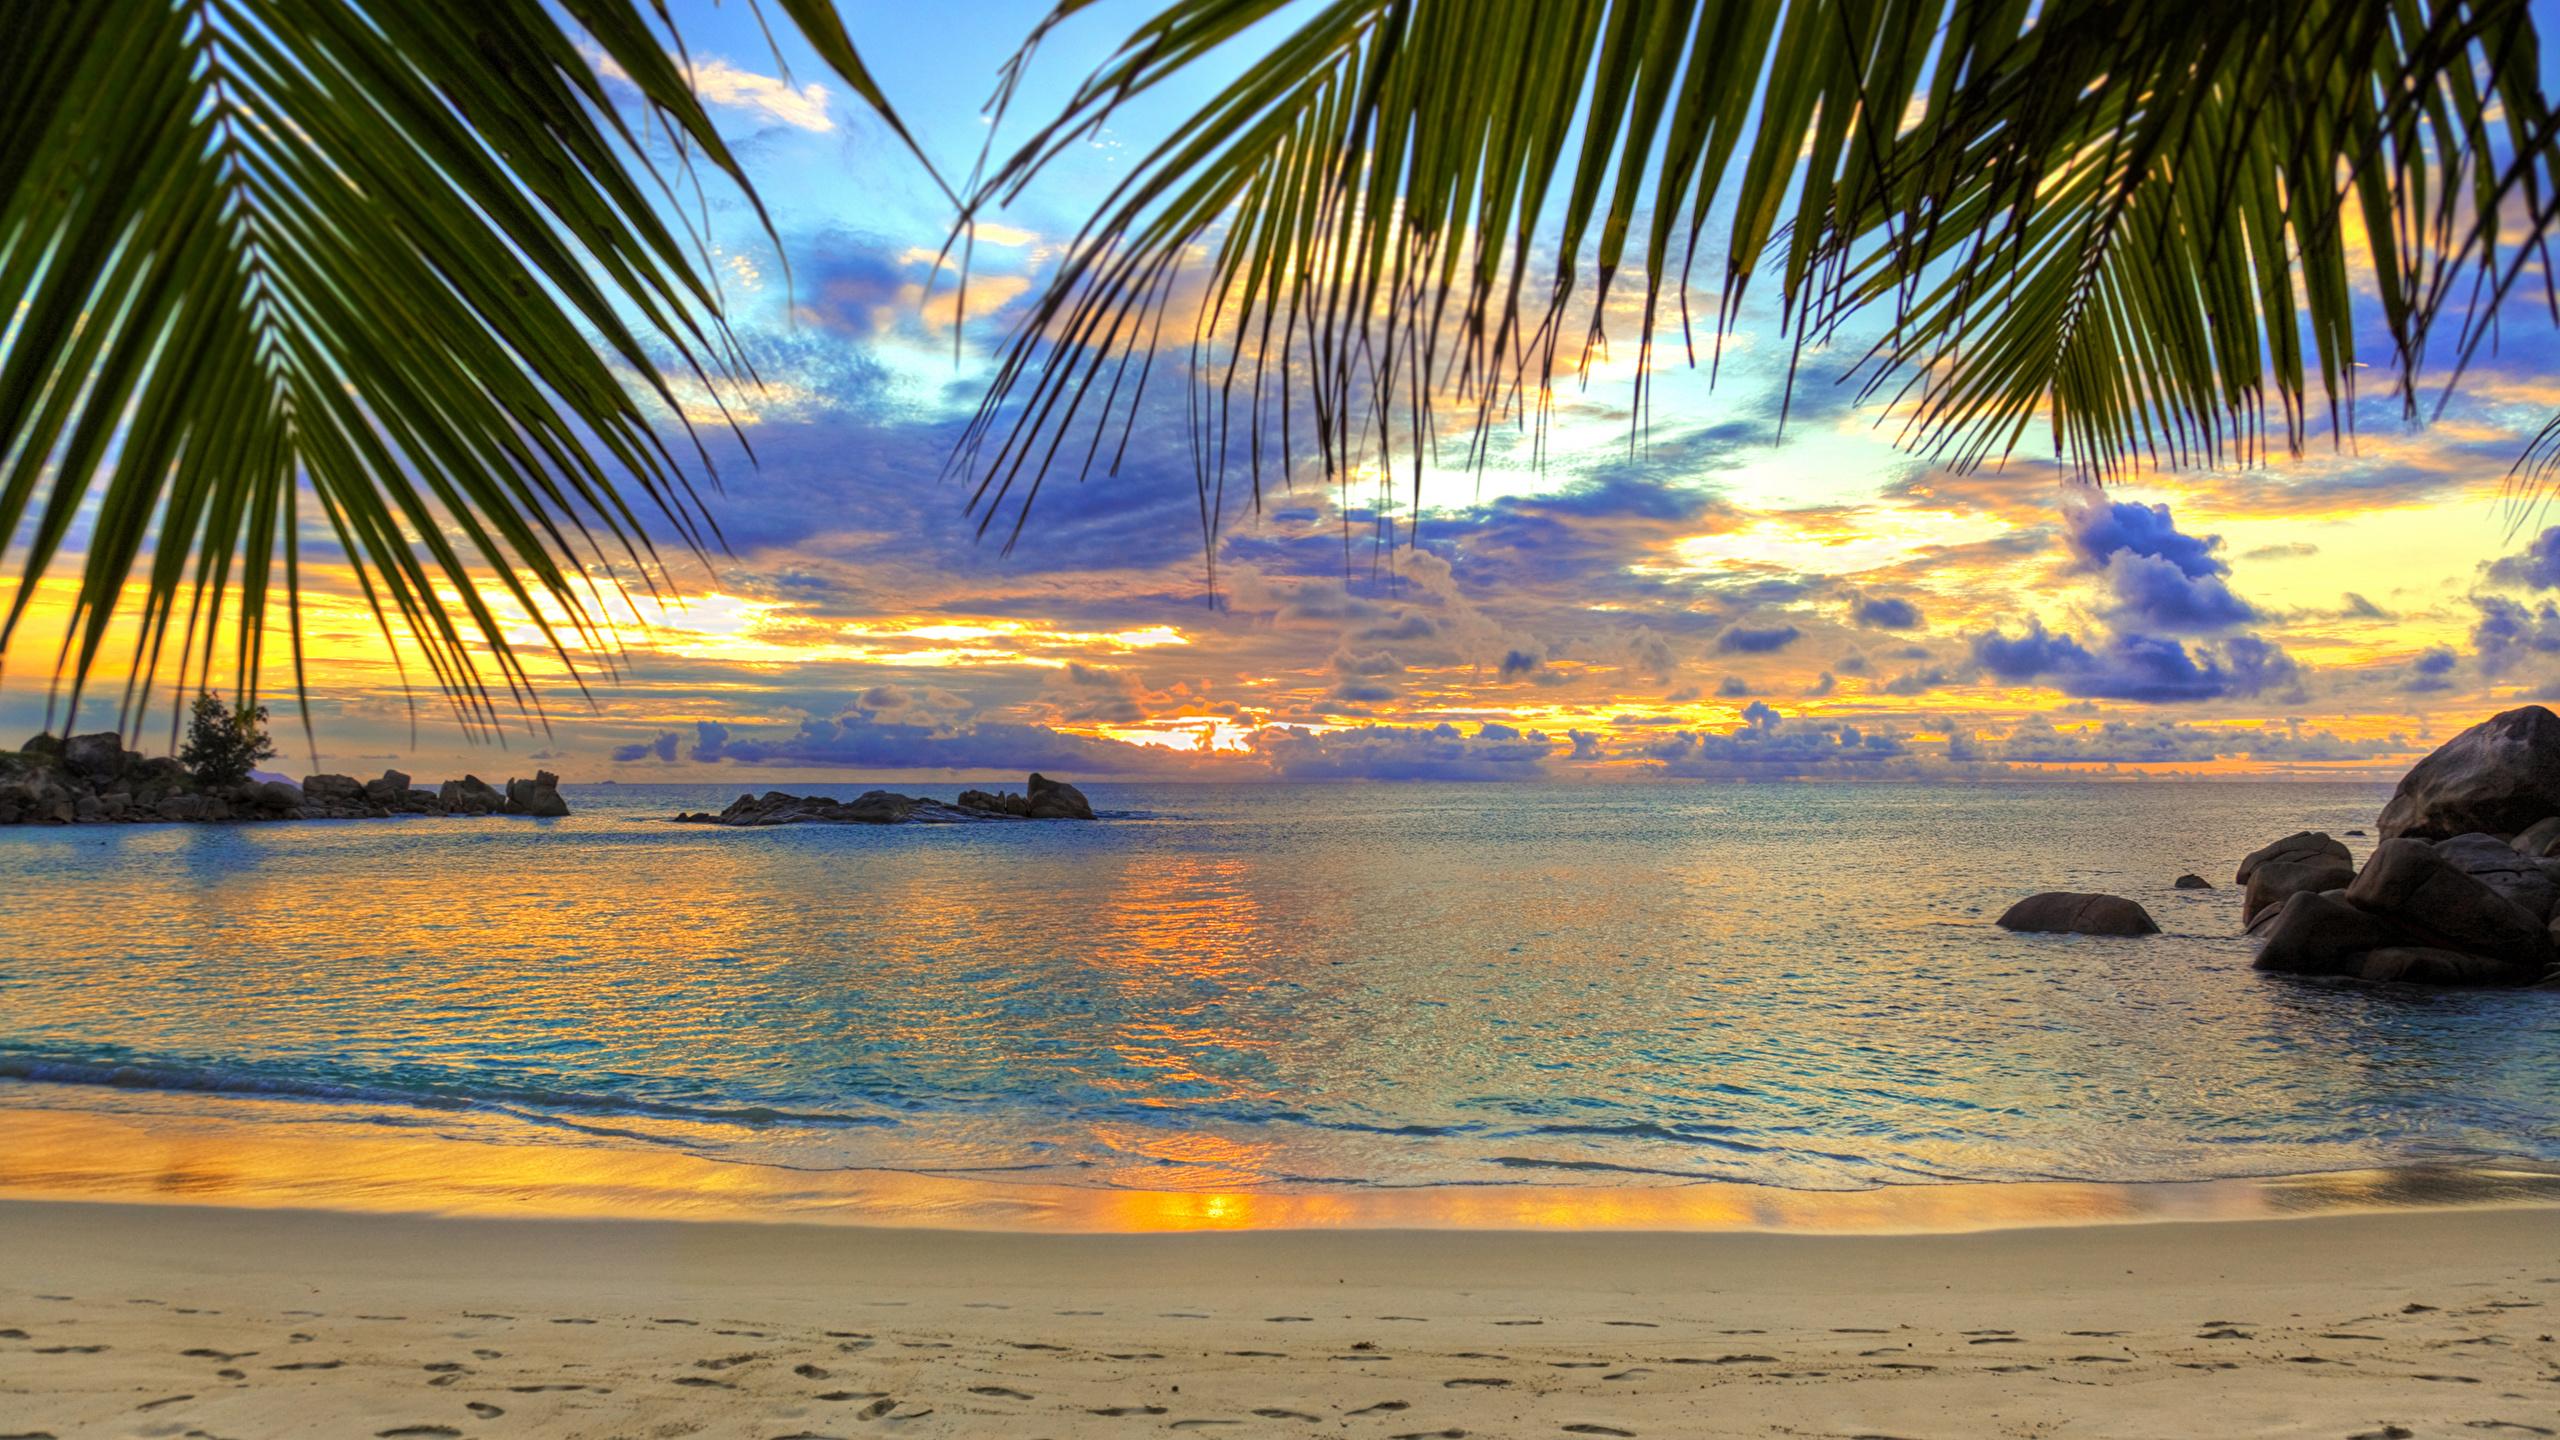 foto strand meer natur palmen 2560x1440